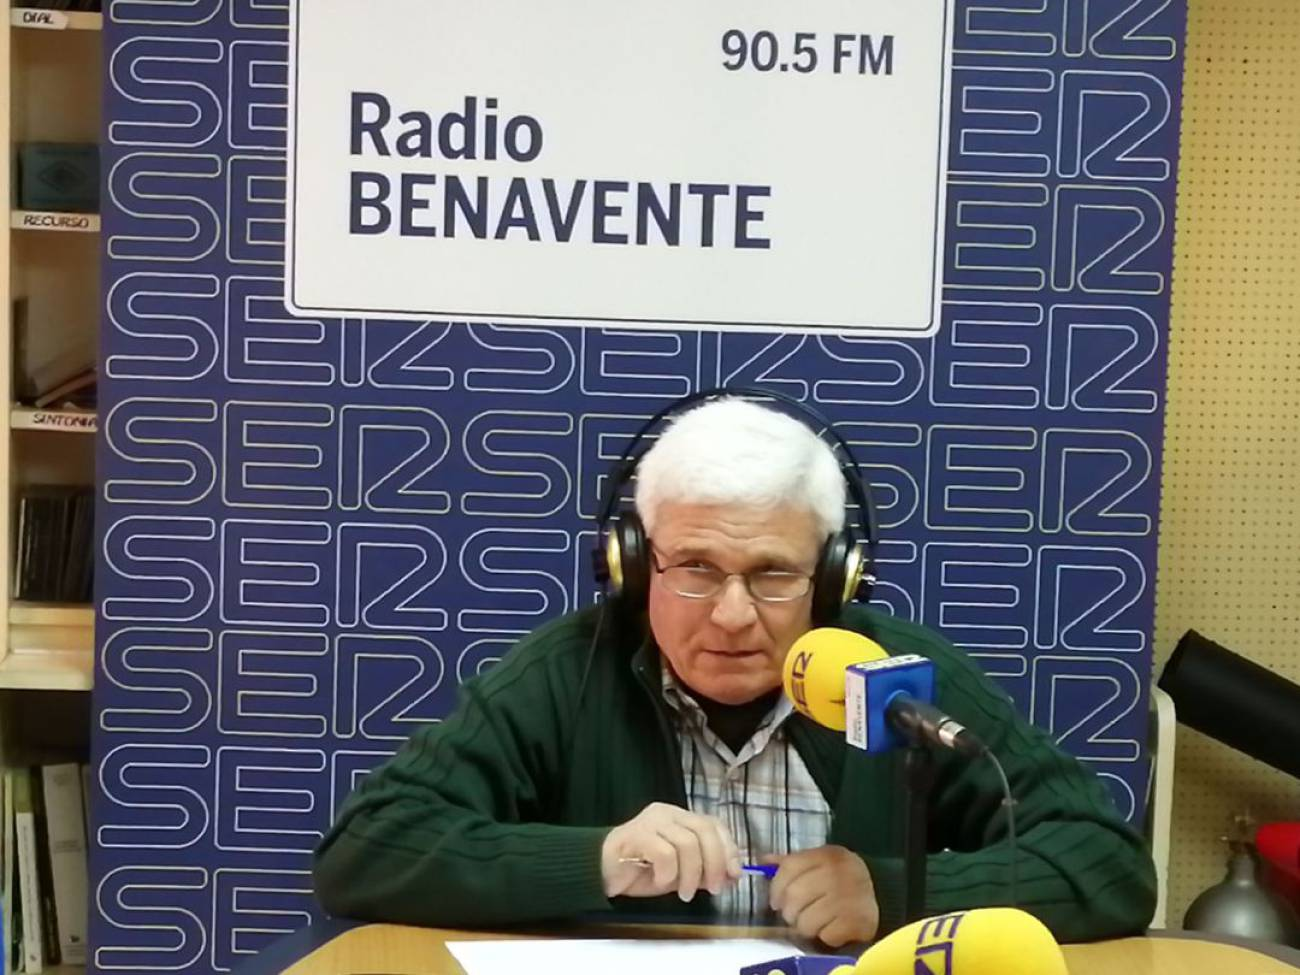 José Luis Ferrero Sandín